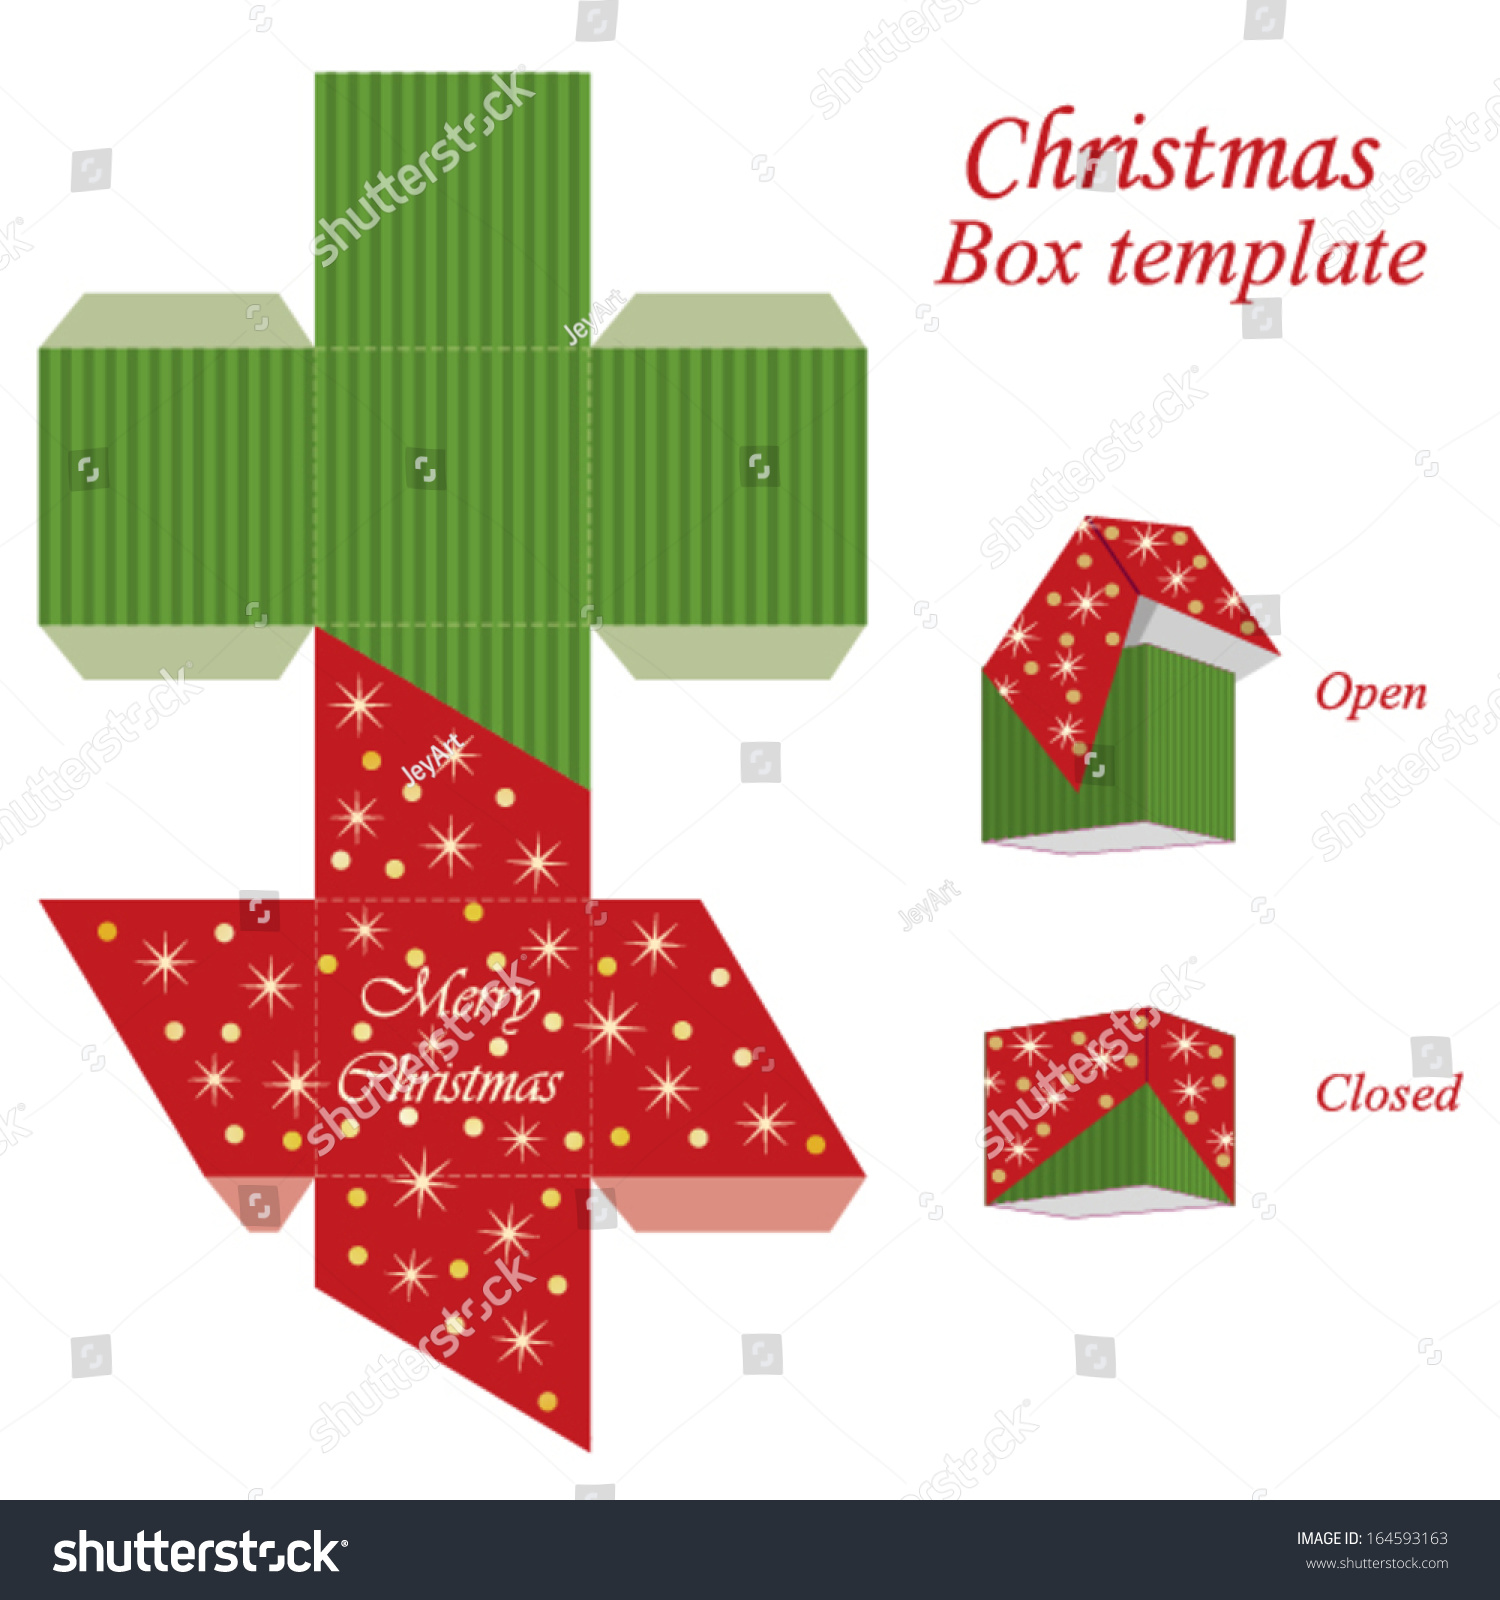 Christmas Gift Box Template Sparkles Snowflakes Stock Vector